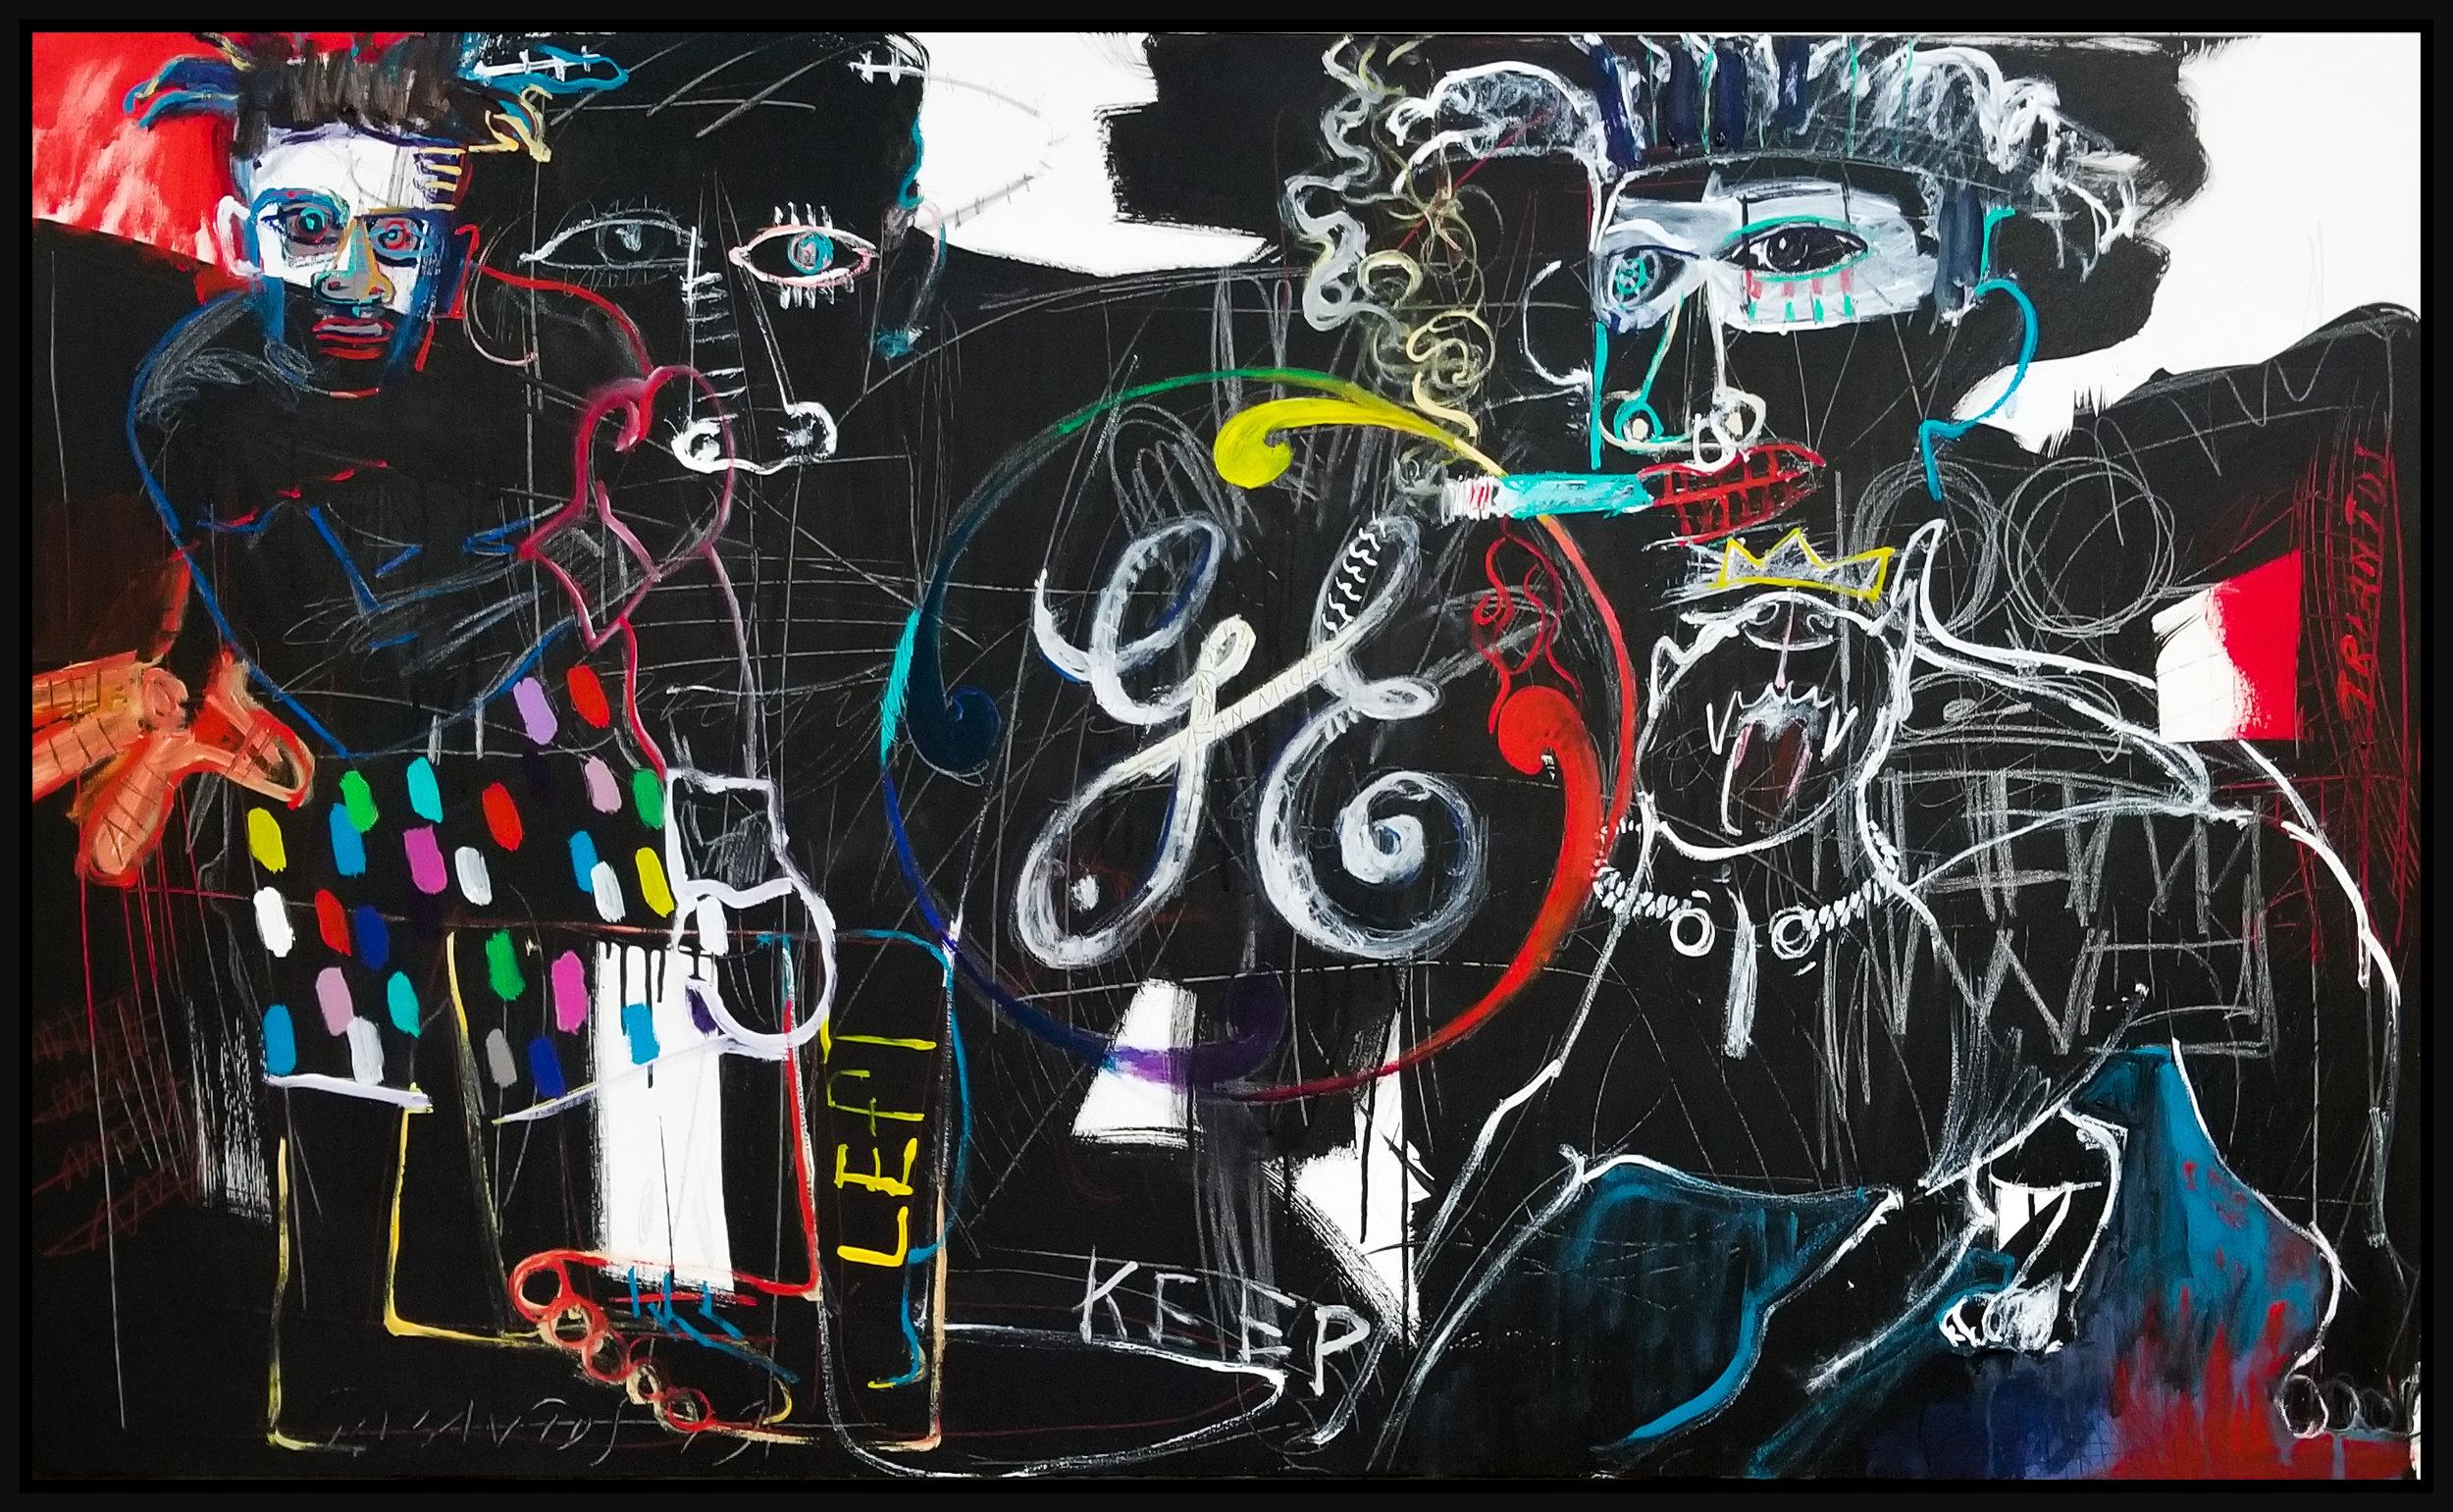 "Homage Basquiat (Untitled #129), 2019, acrylic on canvas, 36"" x 60"" (91.4 x 152 cm)"